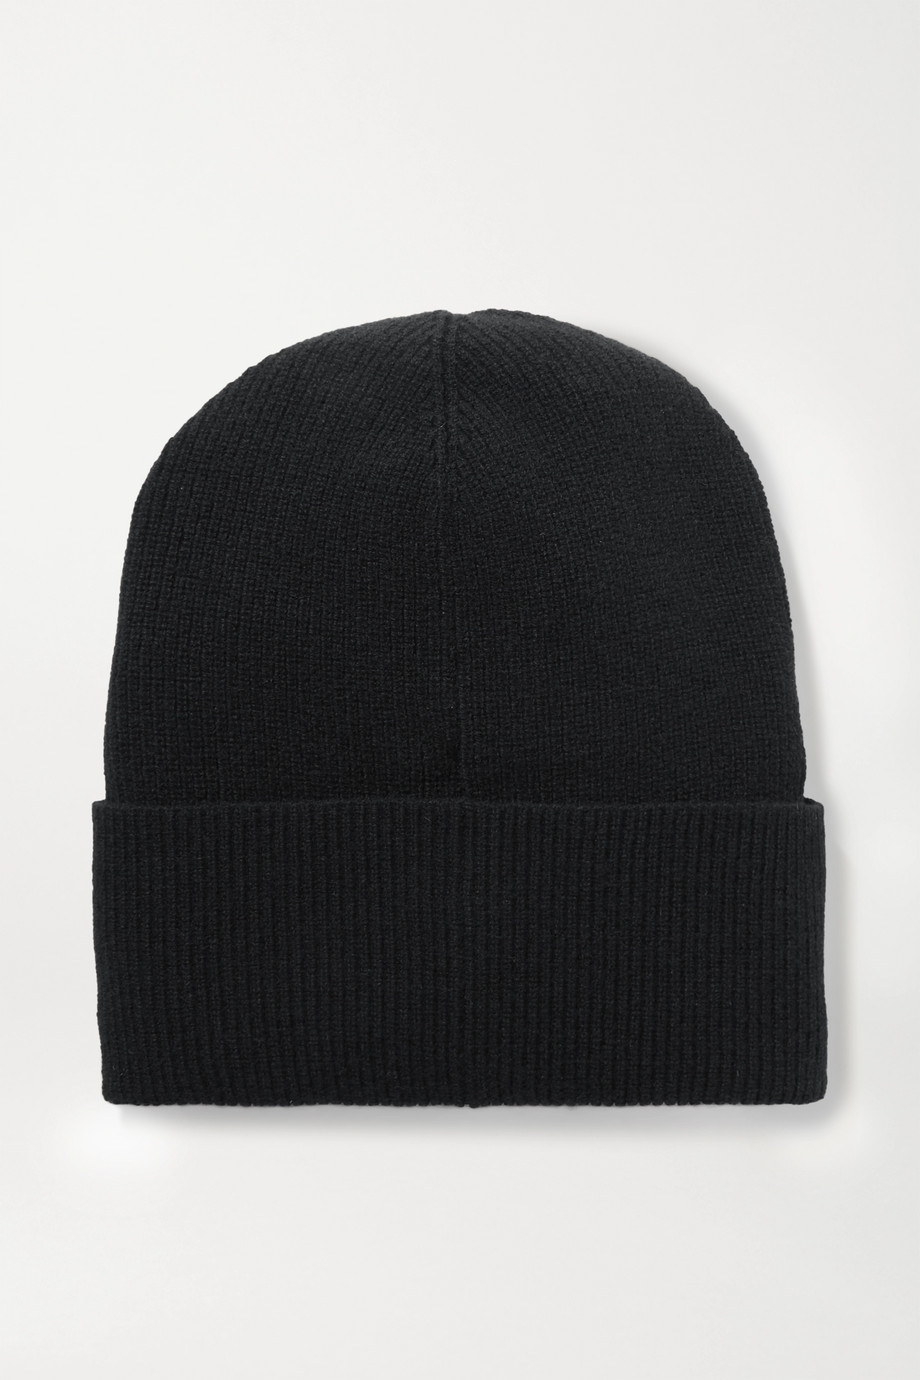 Moncler 贴花羊毛羊绒混纺毛线帽